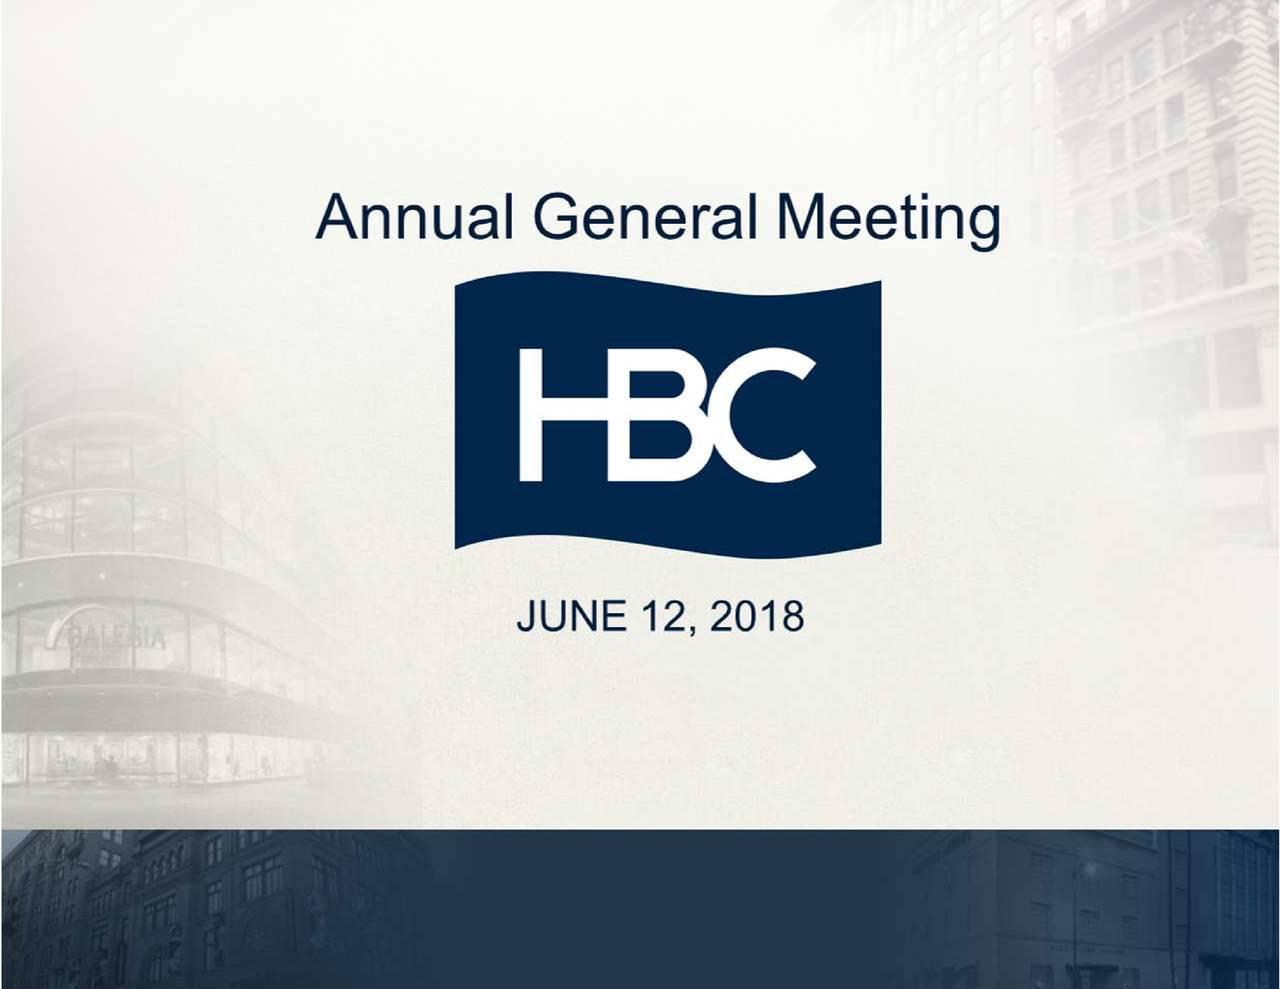 8db9535c1d8a Hudson s Bay (HBAYF) Investor Presentation - Slideshow - Hudson s ...